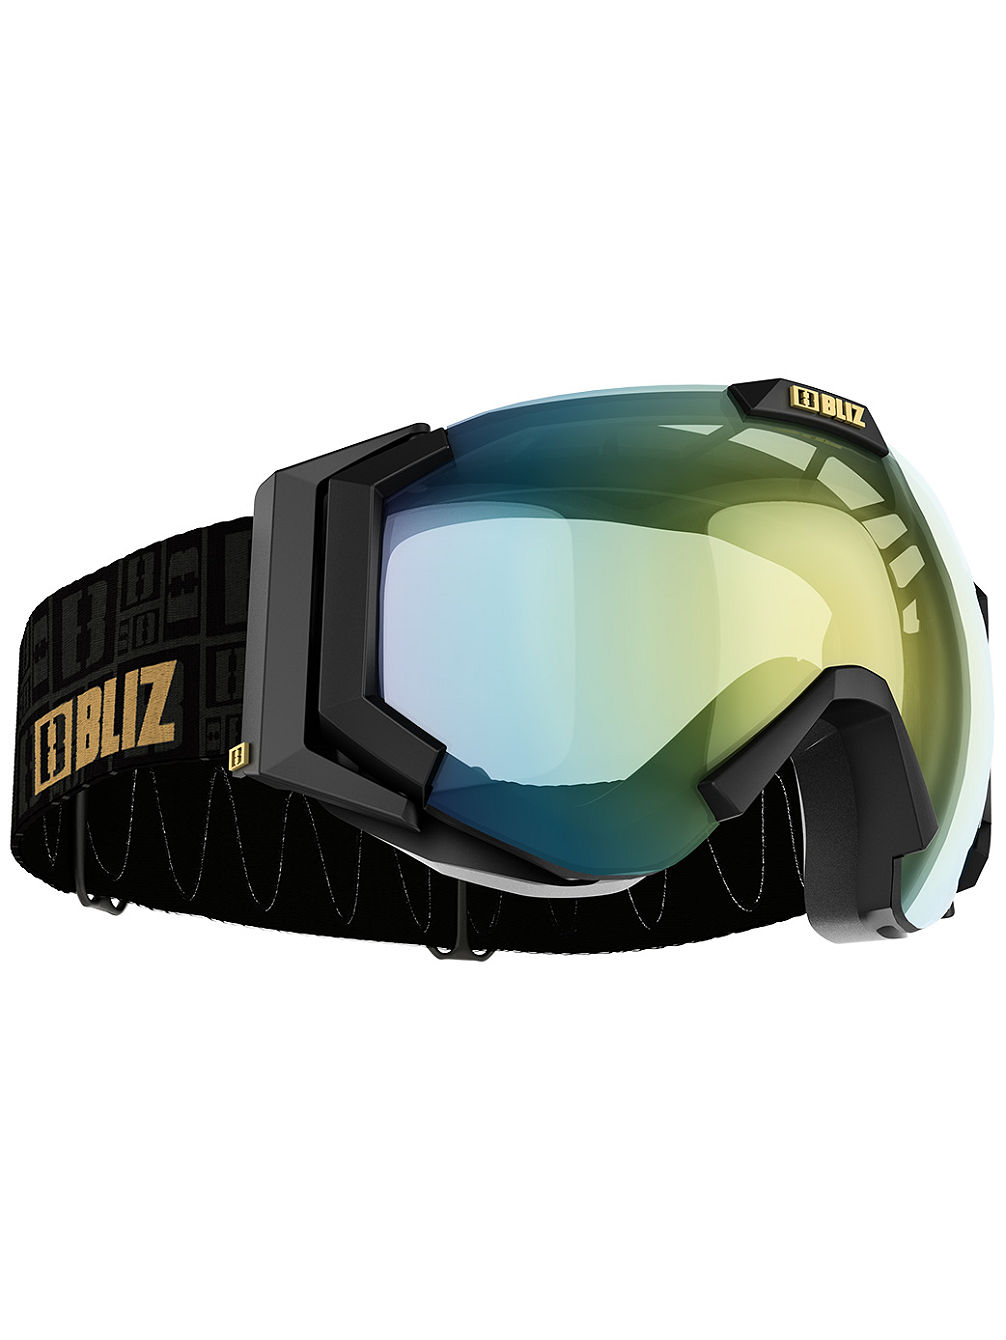 bliz-protective-sports-gear-caver-smallface-matt-black